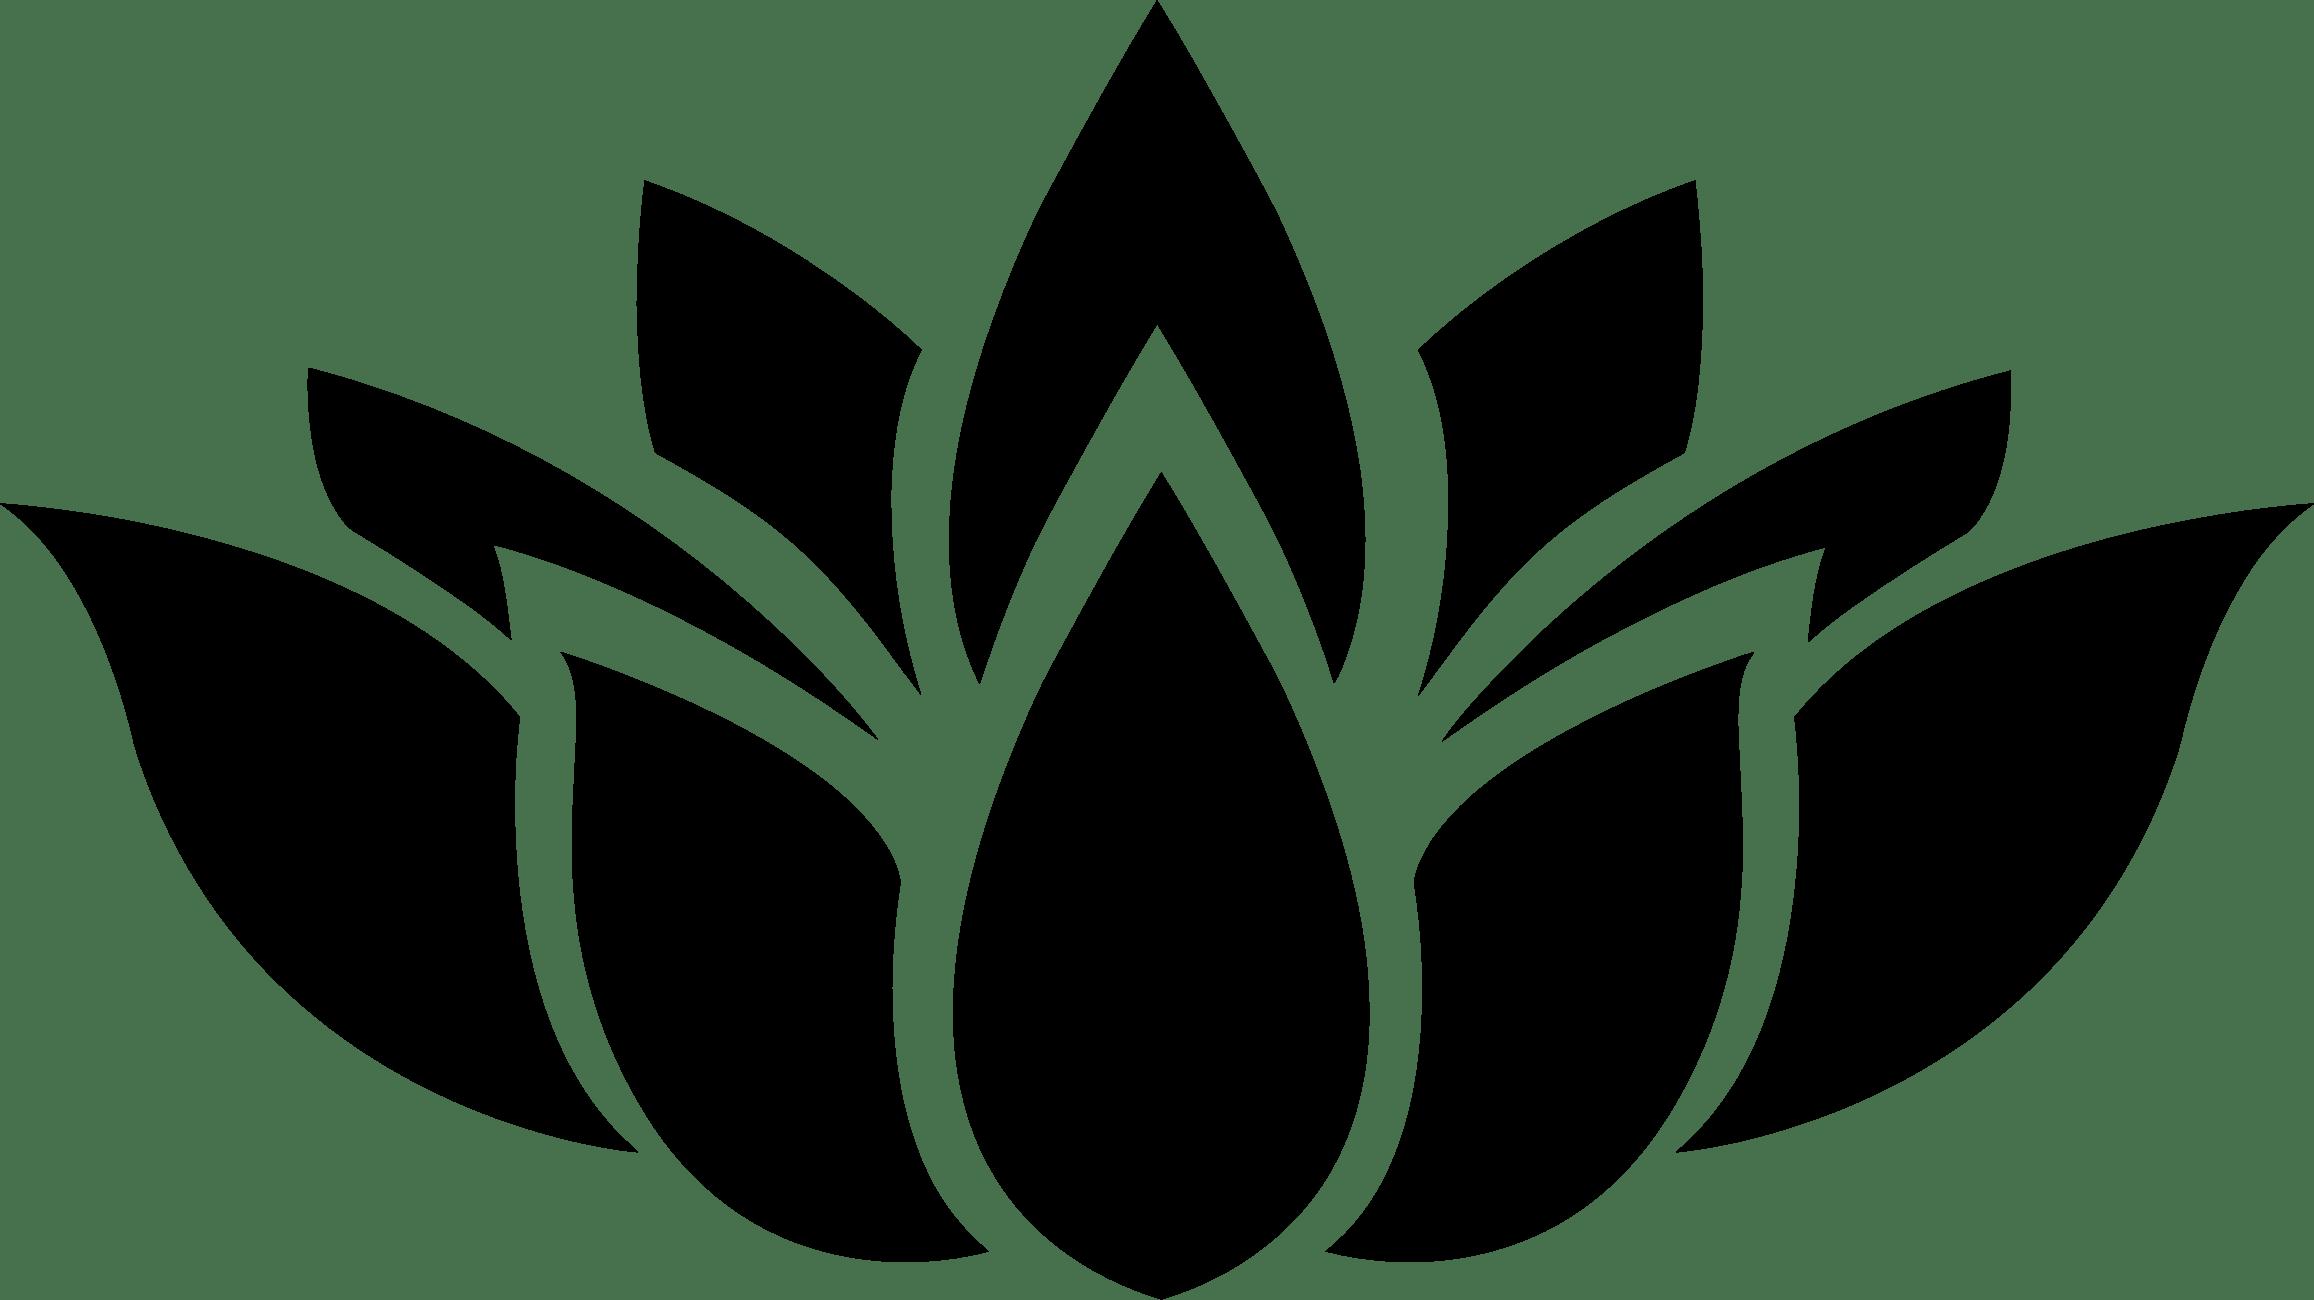 White Lotus Graphic Art Wallpapers Top Free White Lotus Graphic